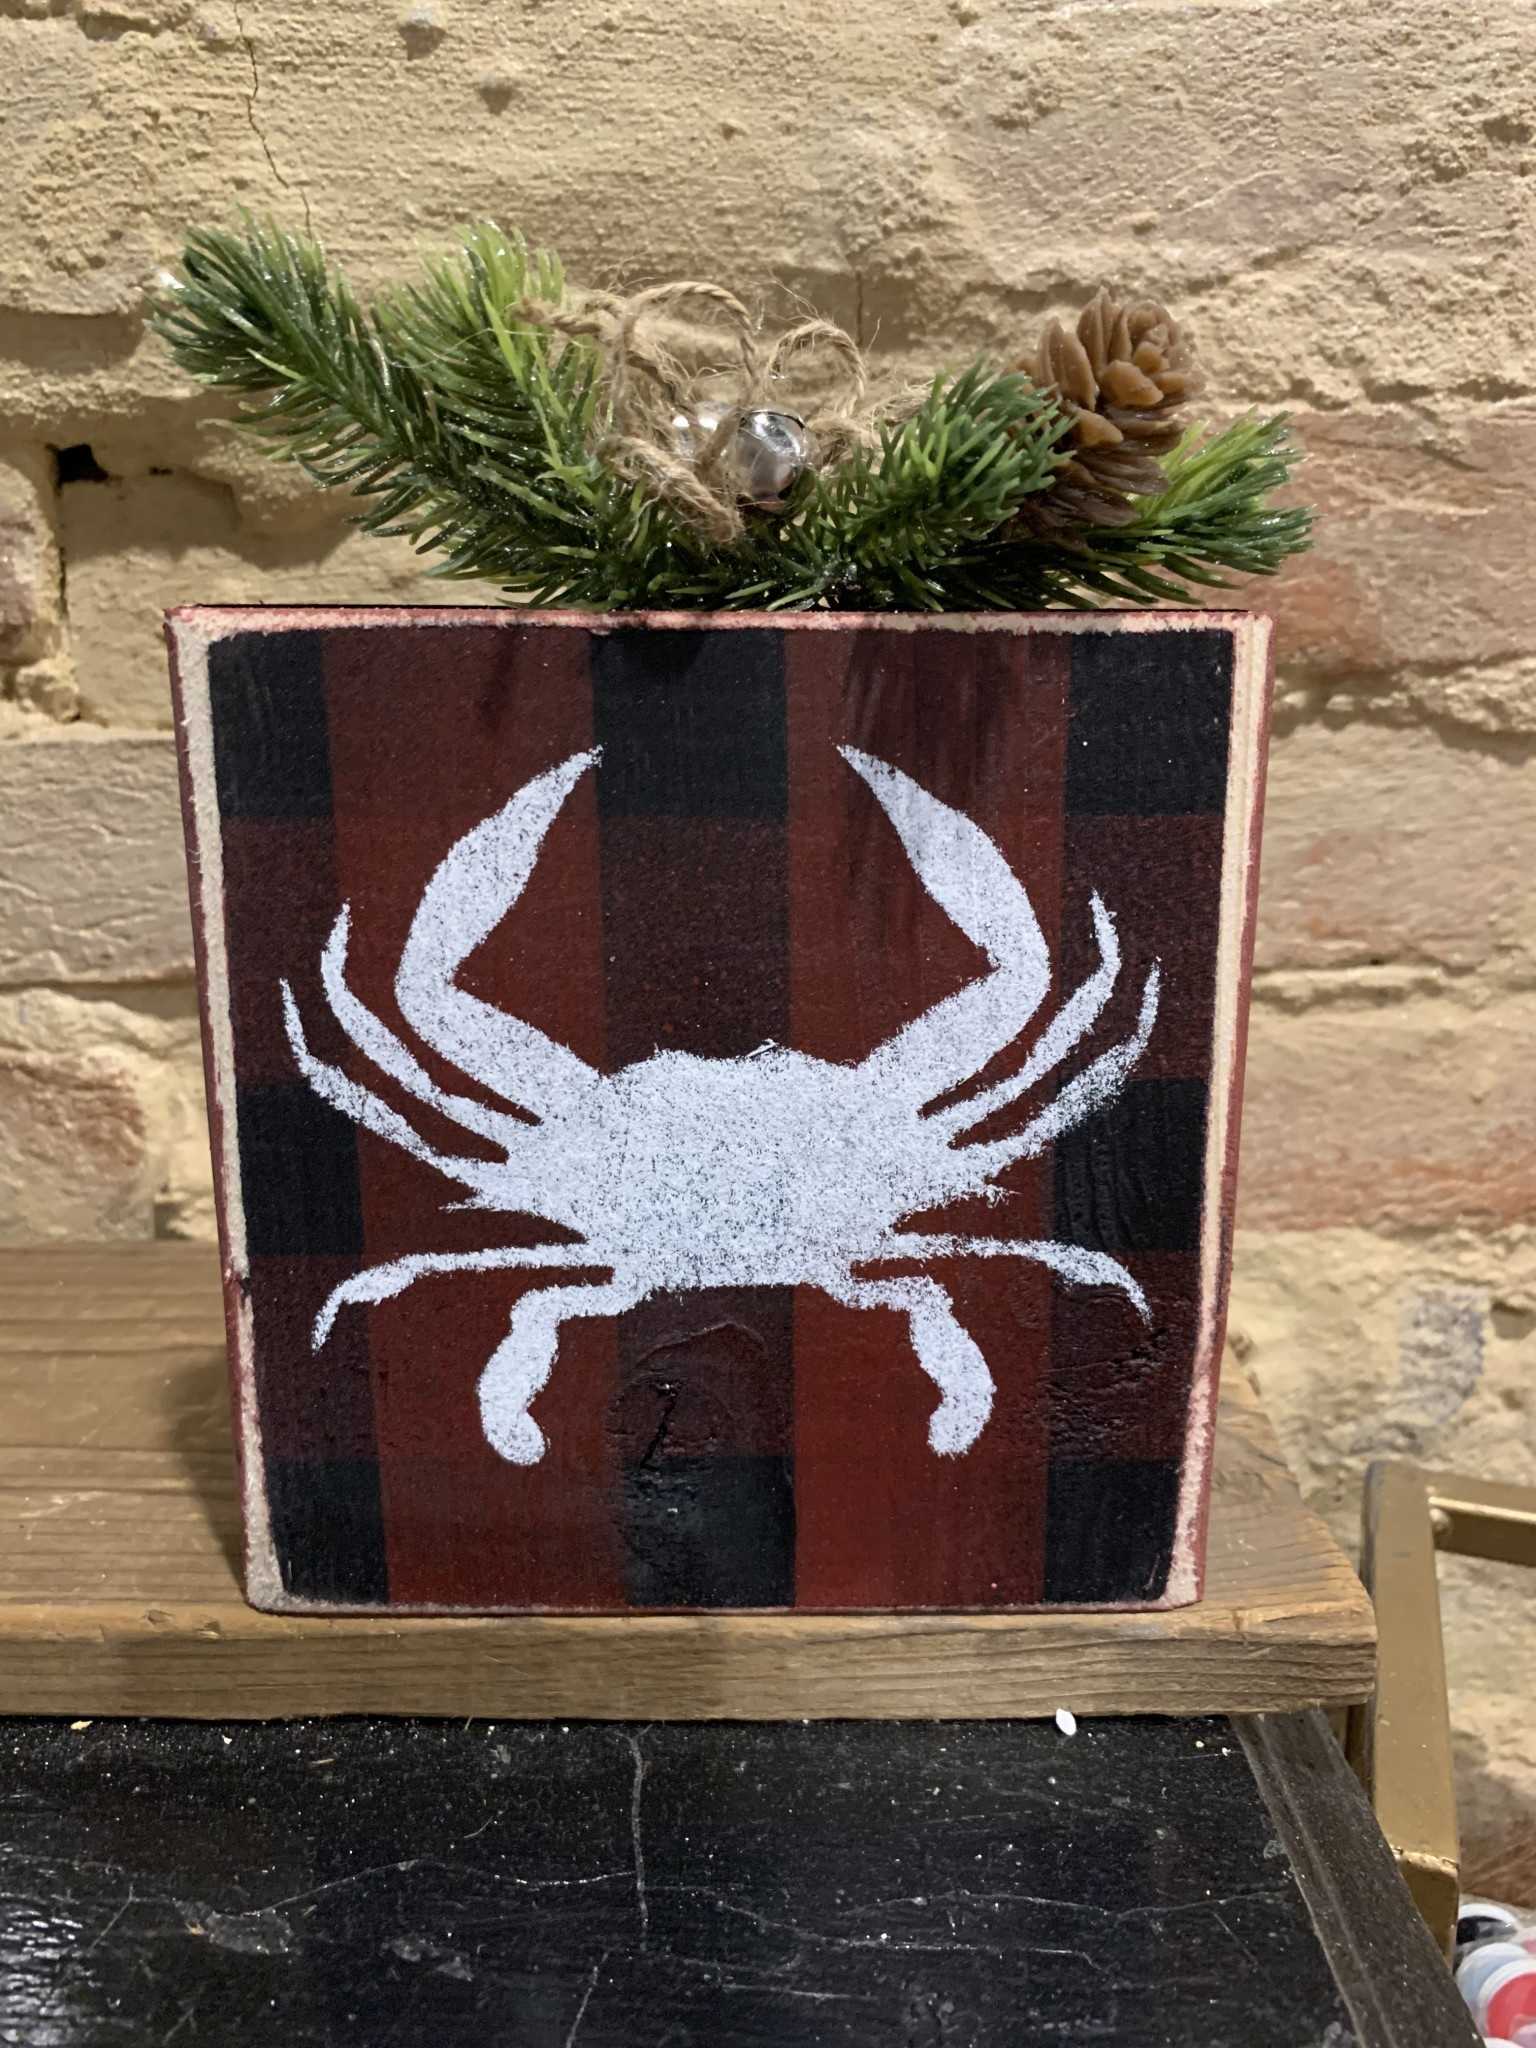 The Painted Mermaid Buffalo Plaid Block - Crab